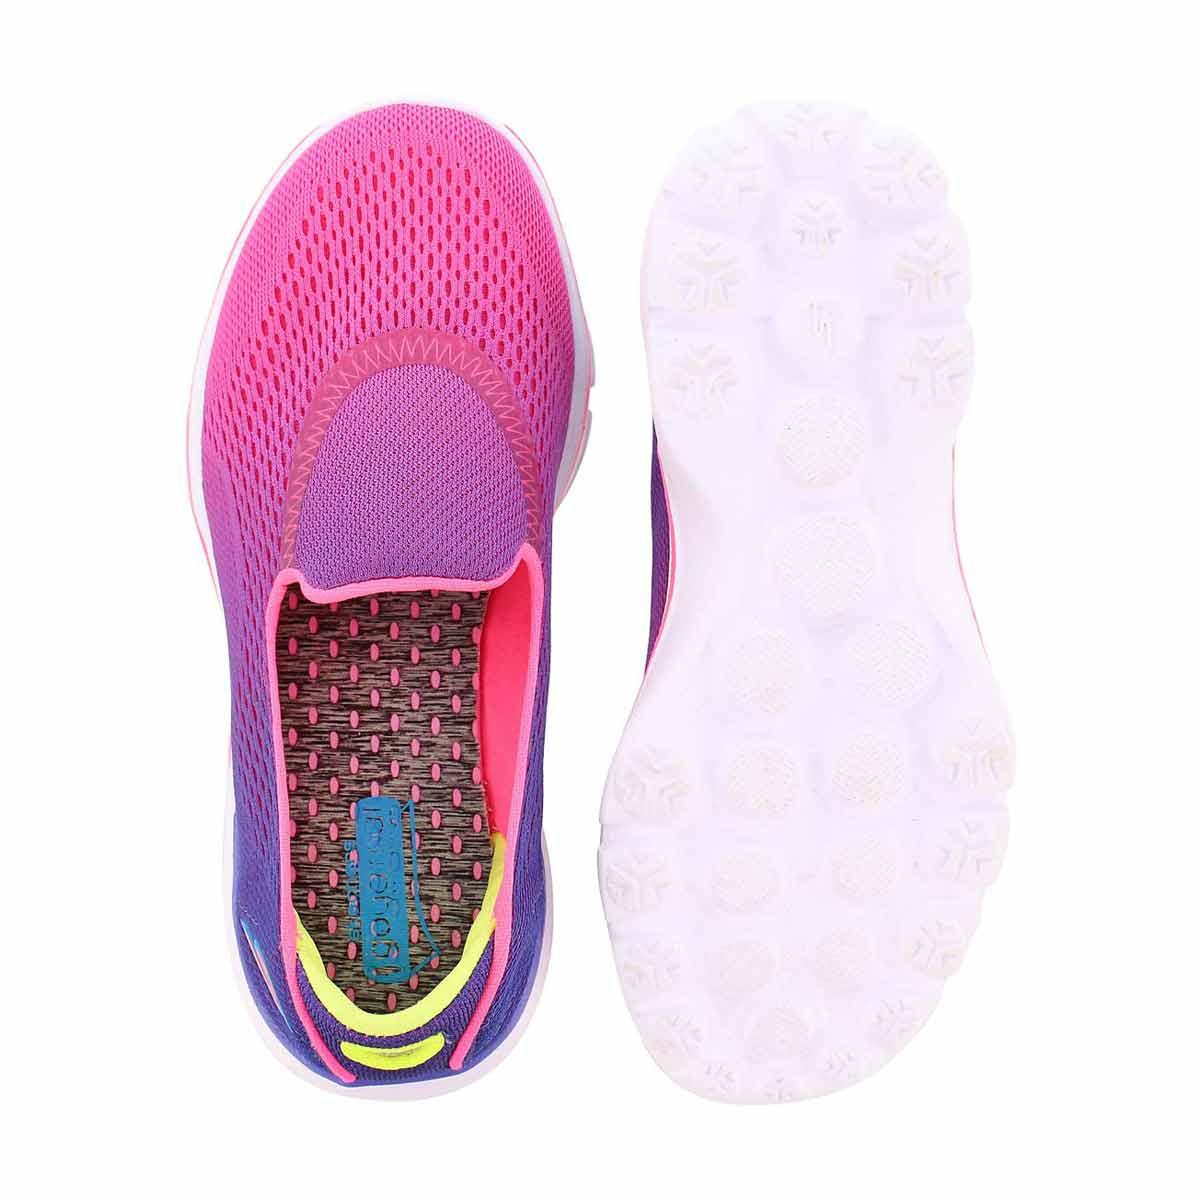 Grls GOwalk 3 ppl/pnk ombre slip on